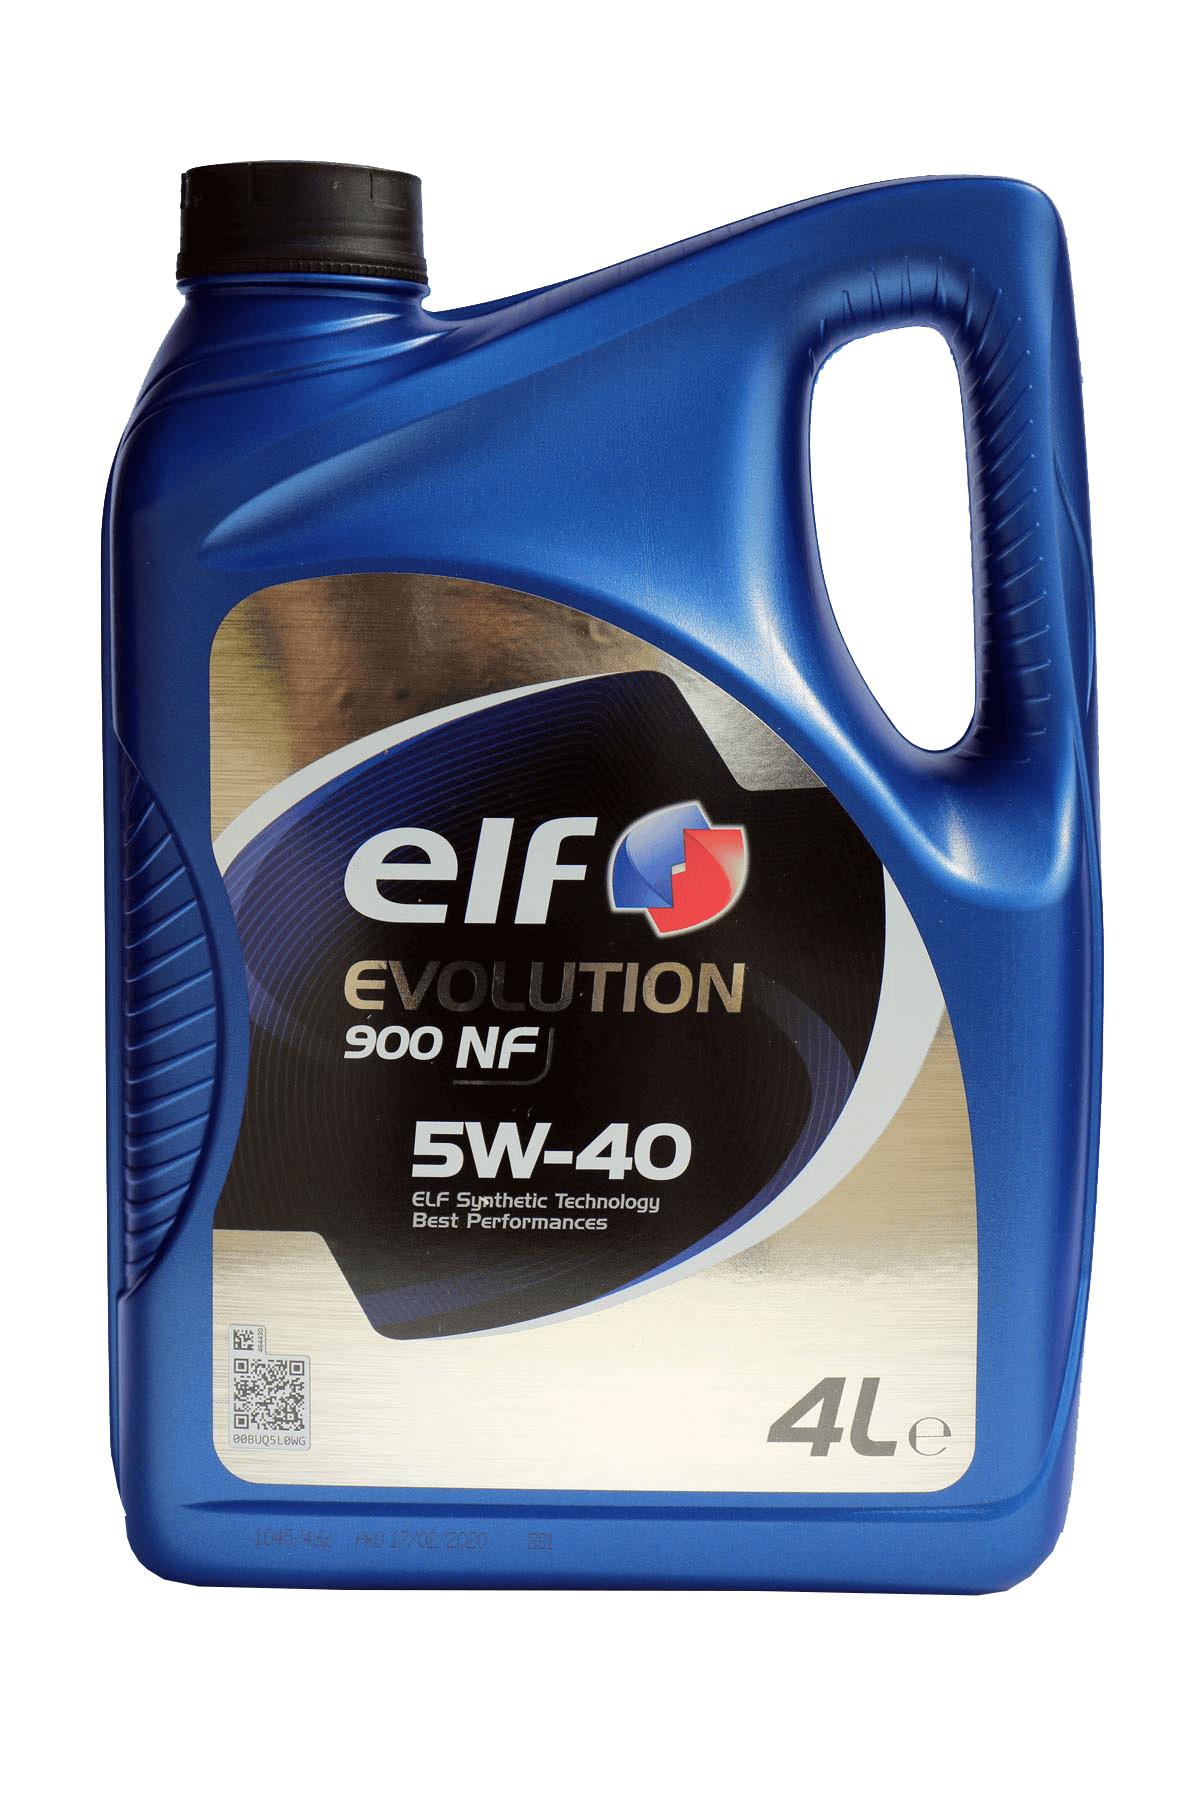 ELF Evolution 900 NF 5W-40 Motoröl, 4l